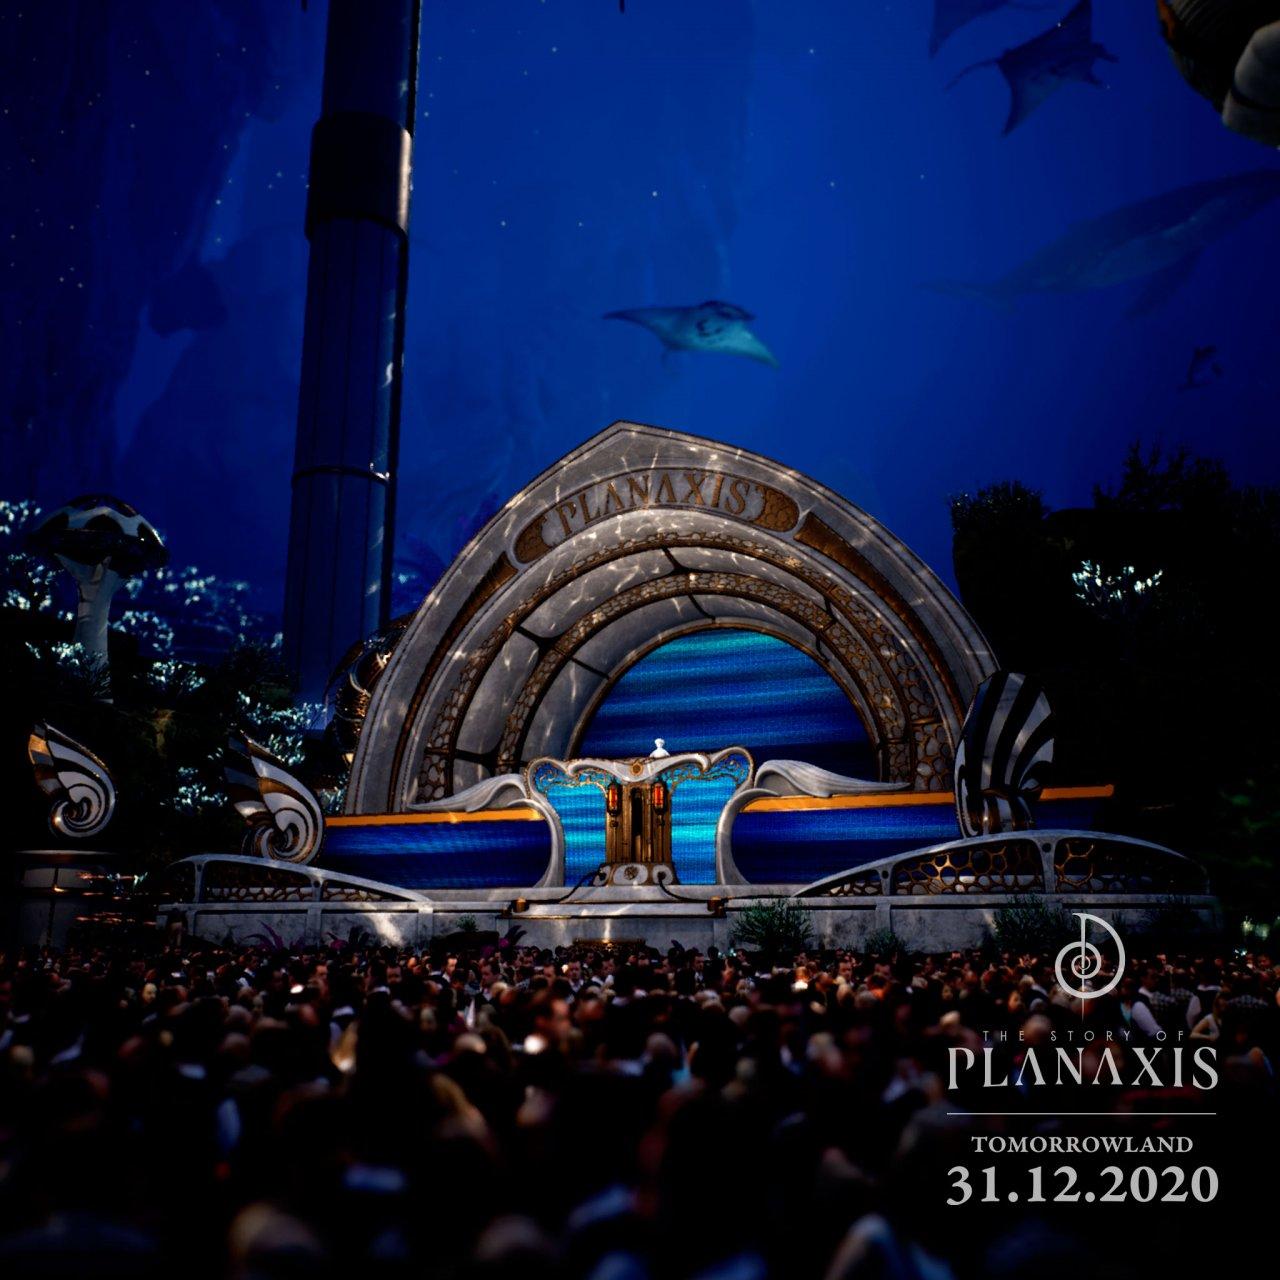 Planaxis – Square_1jpg